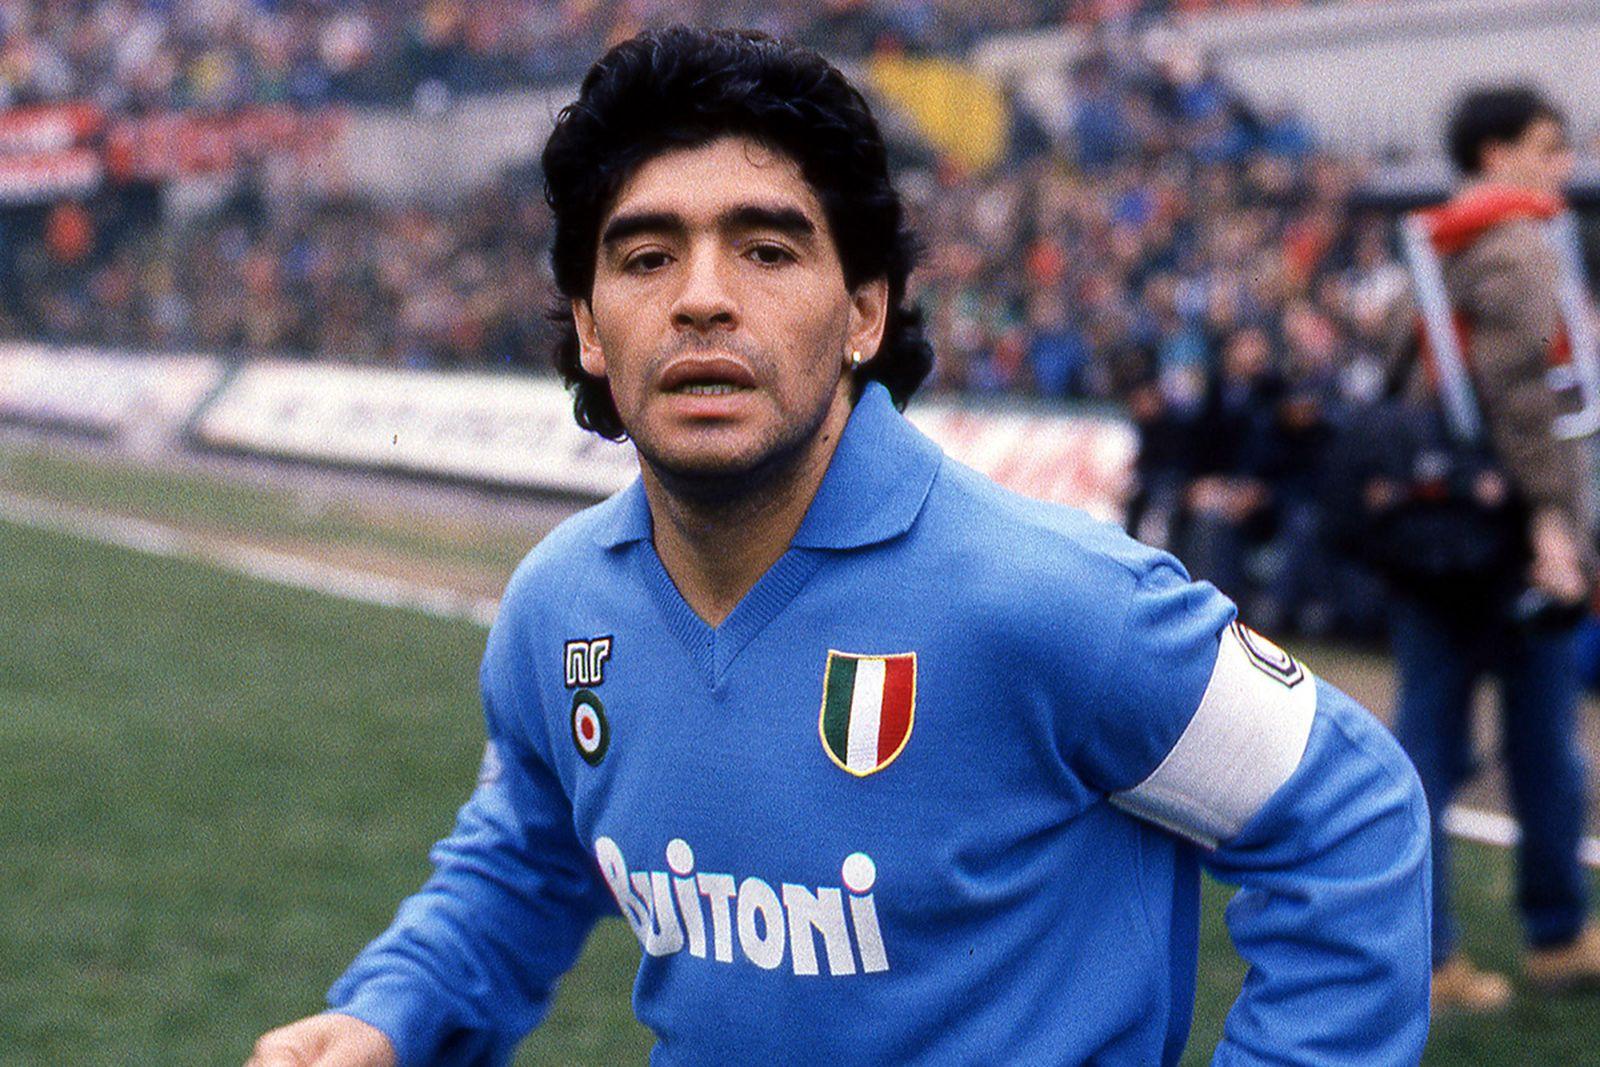 a-look-back-at-maradona-80s-02